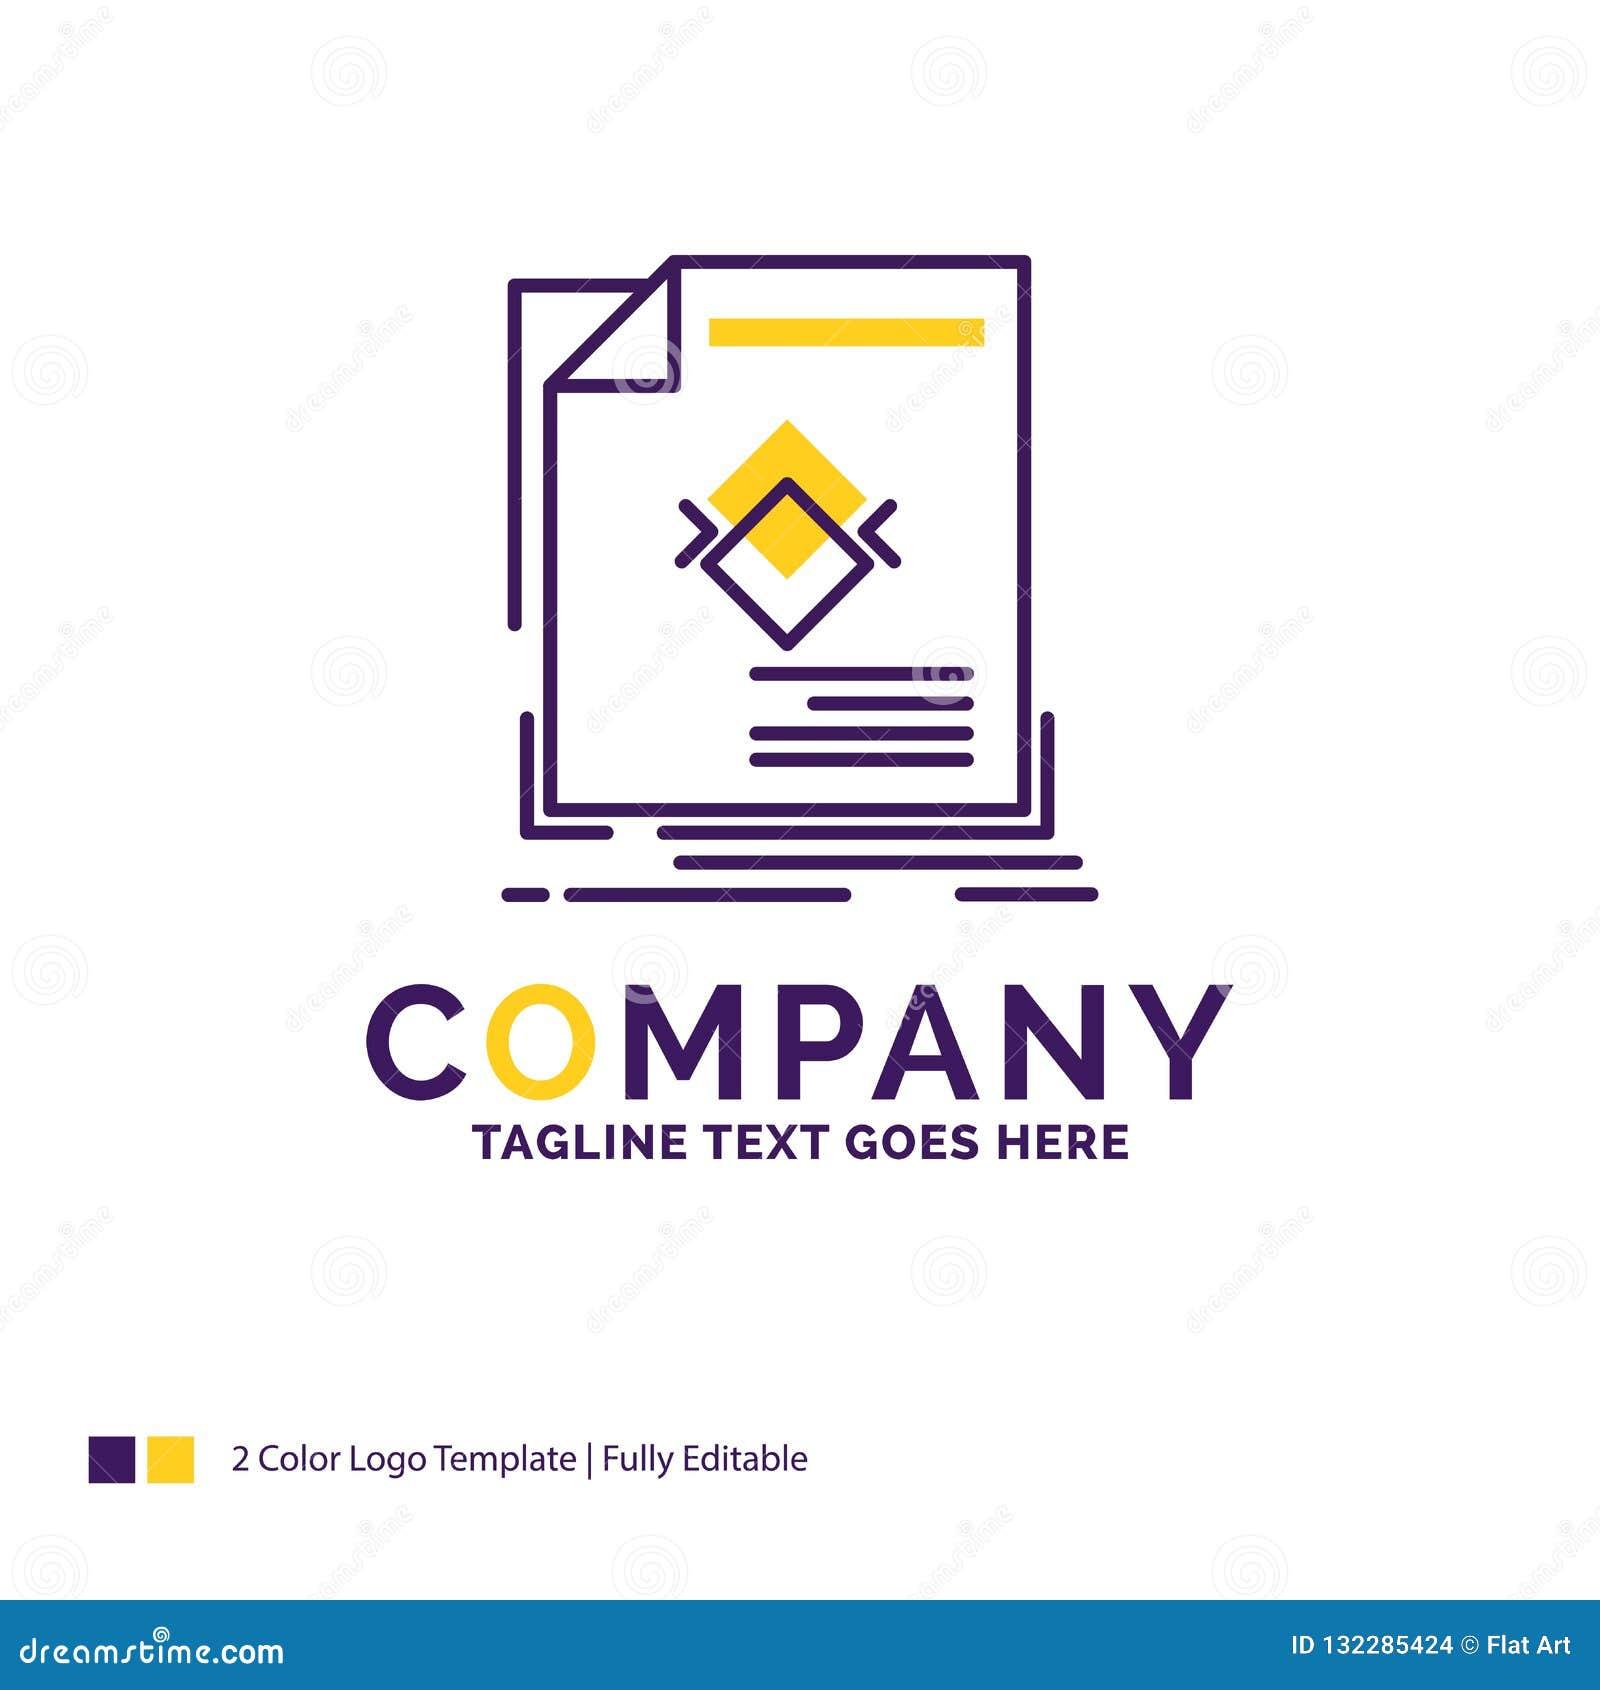 Company Name Logo Design For ad, advertisement, leaflet, magazin